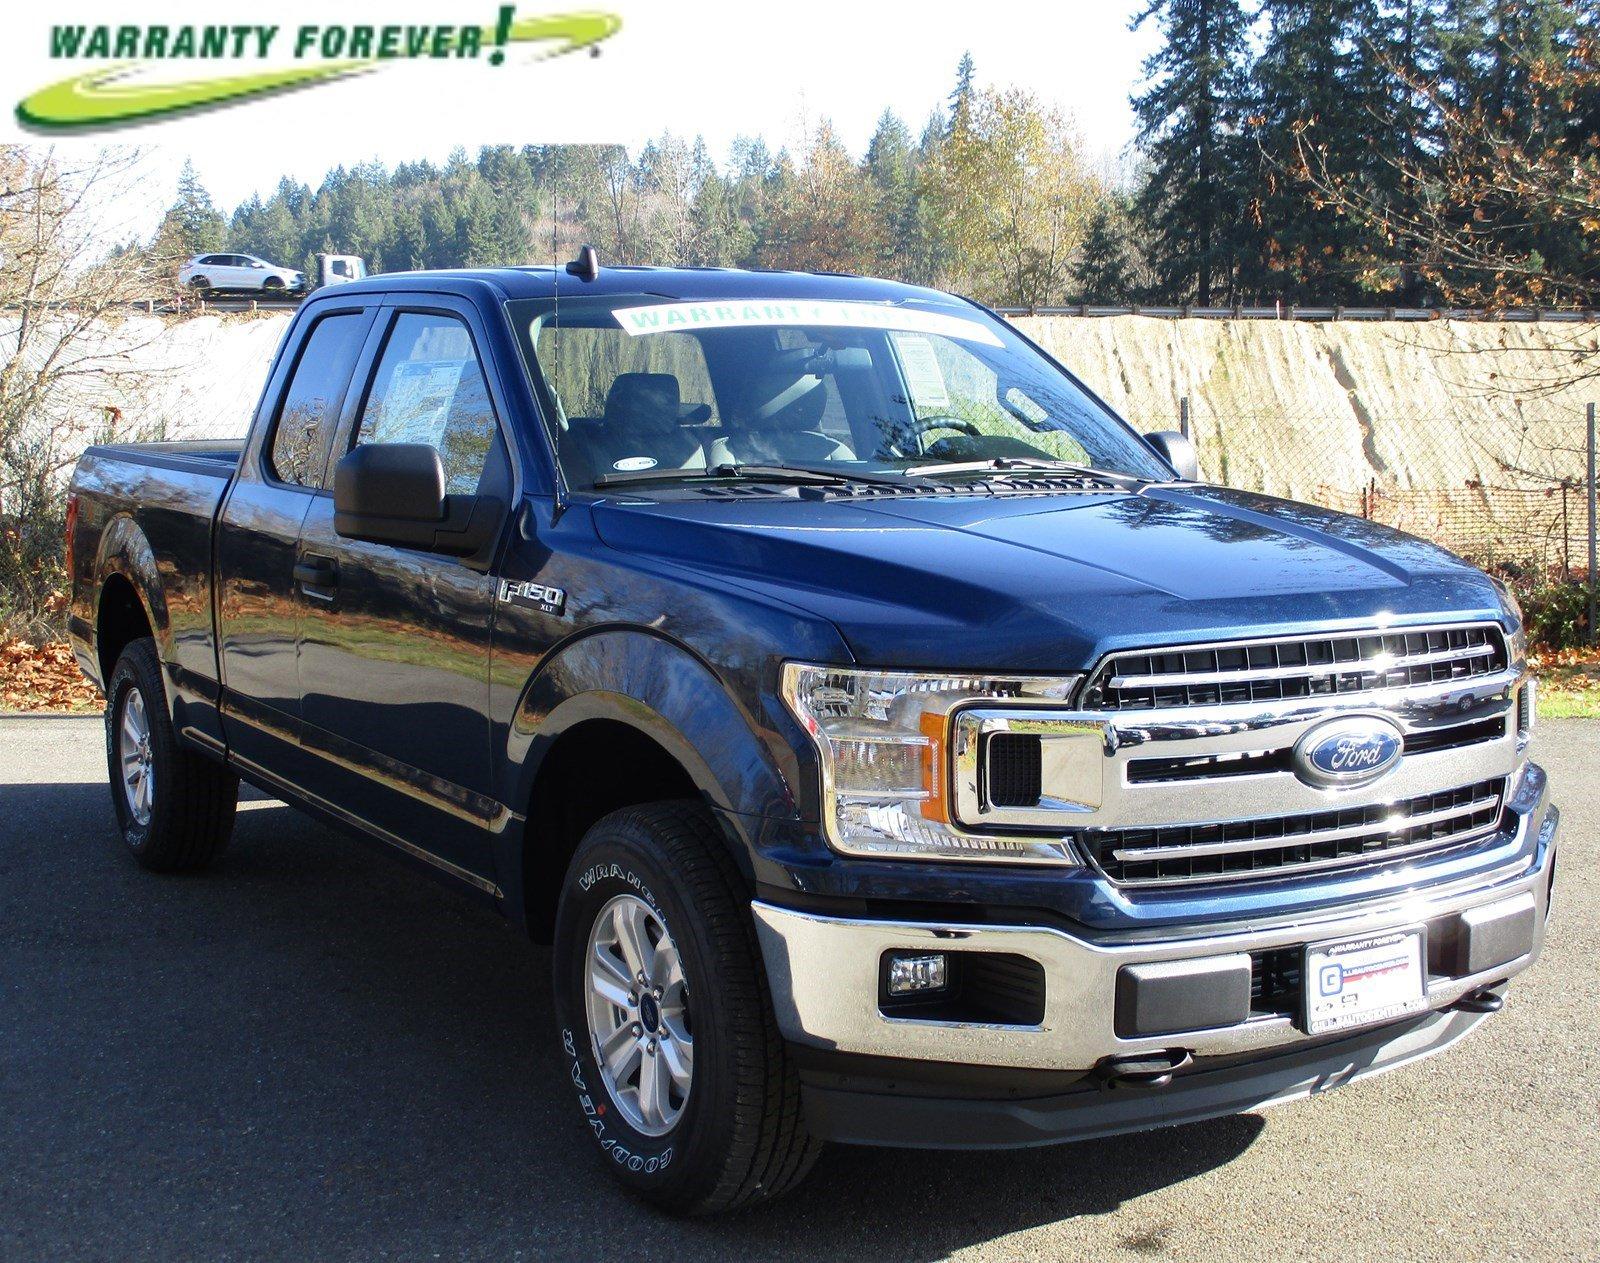 New-2019-Ford-F-150-XLT-4WD-SuperCab-65'-Box